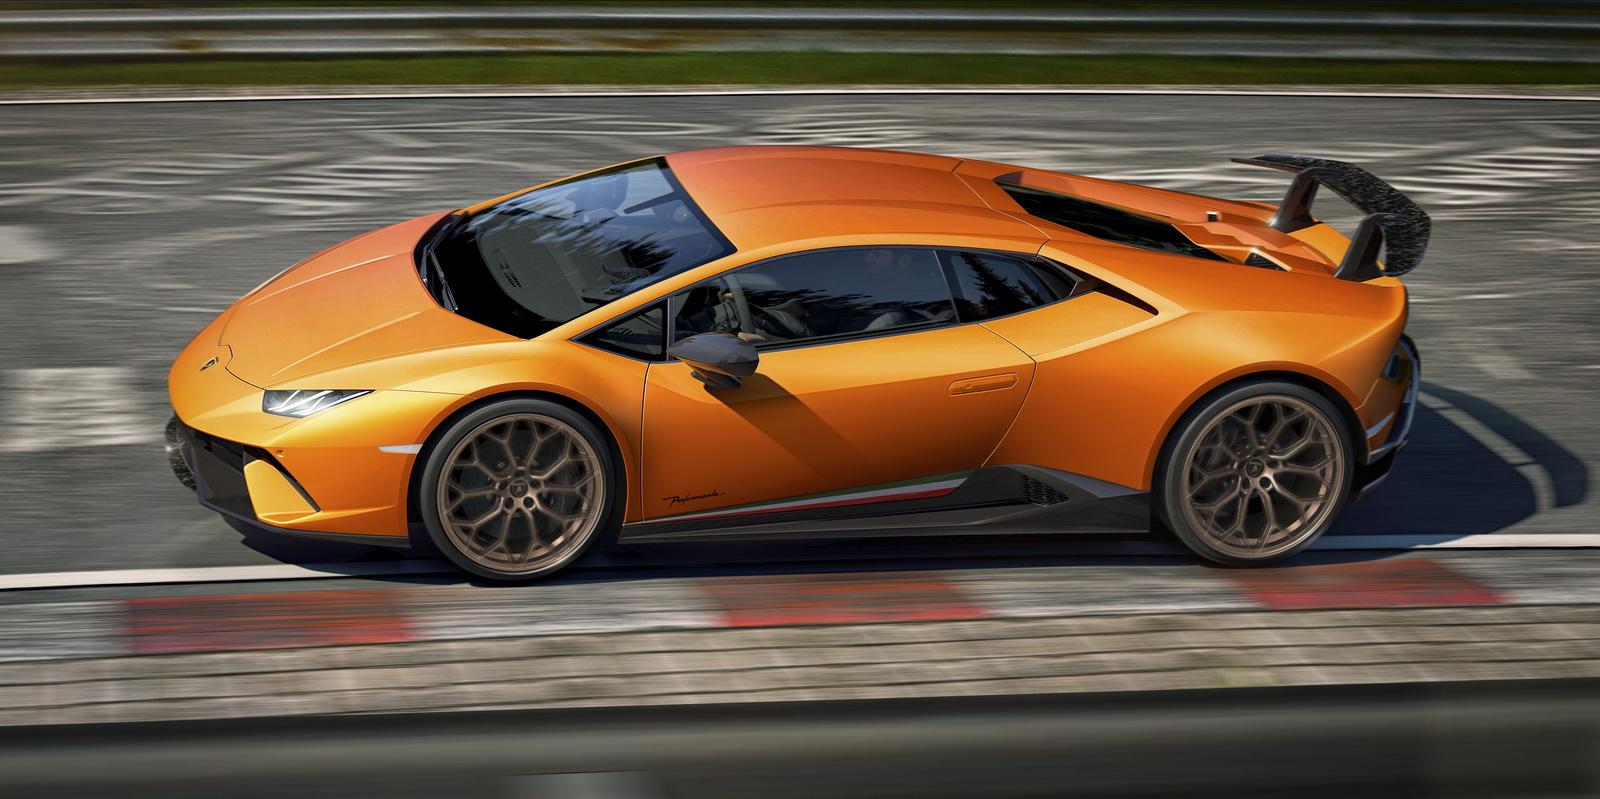 Lamborghini Huracan Performante 2018 (7)